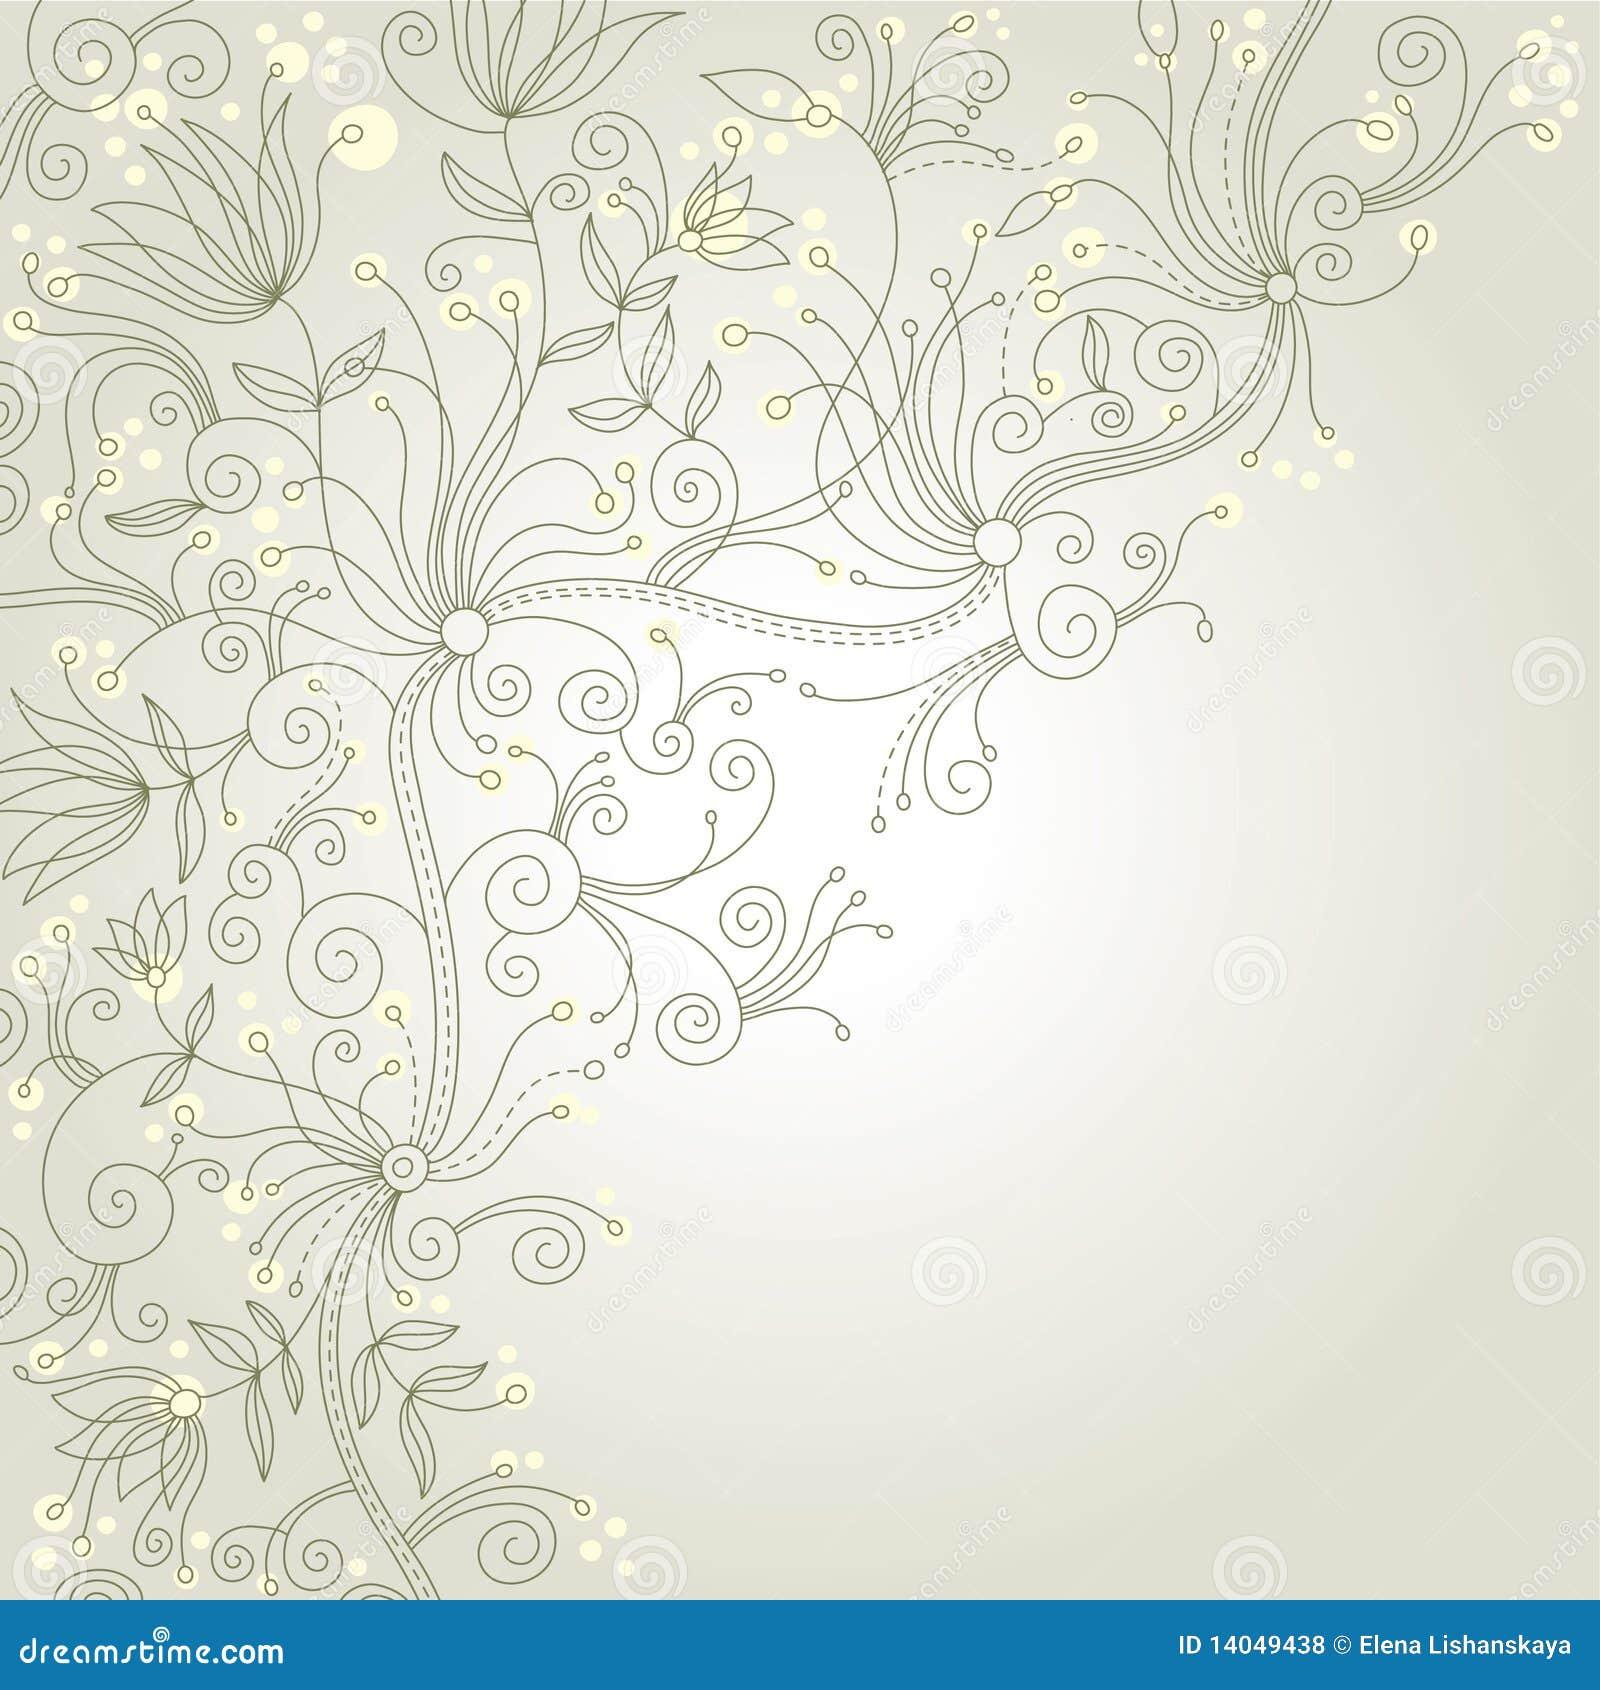 Romantic Wedding Invitations 011 - Romantic Wedding Invitations